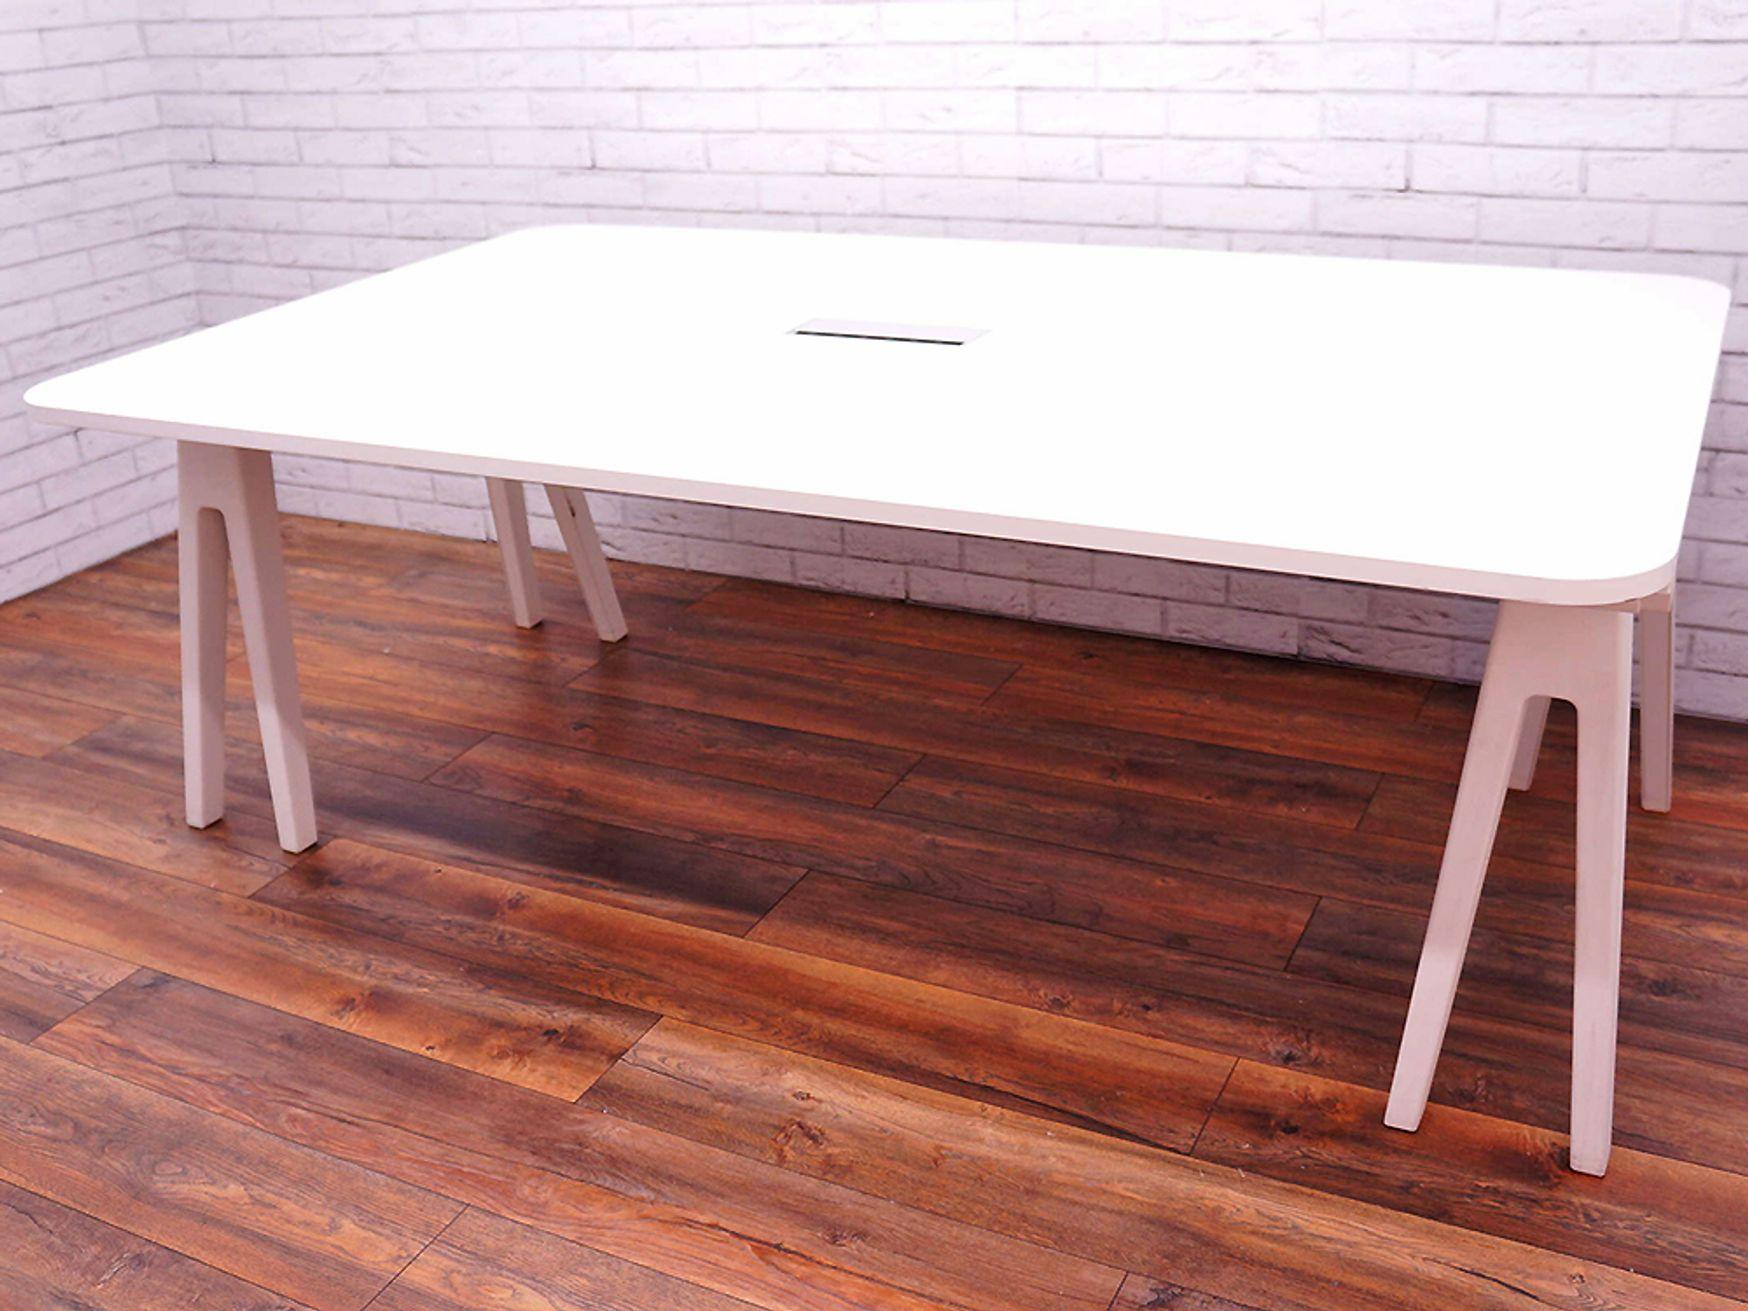 Vitra Joyn Used 4 Person Desk/Table